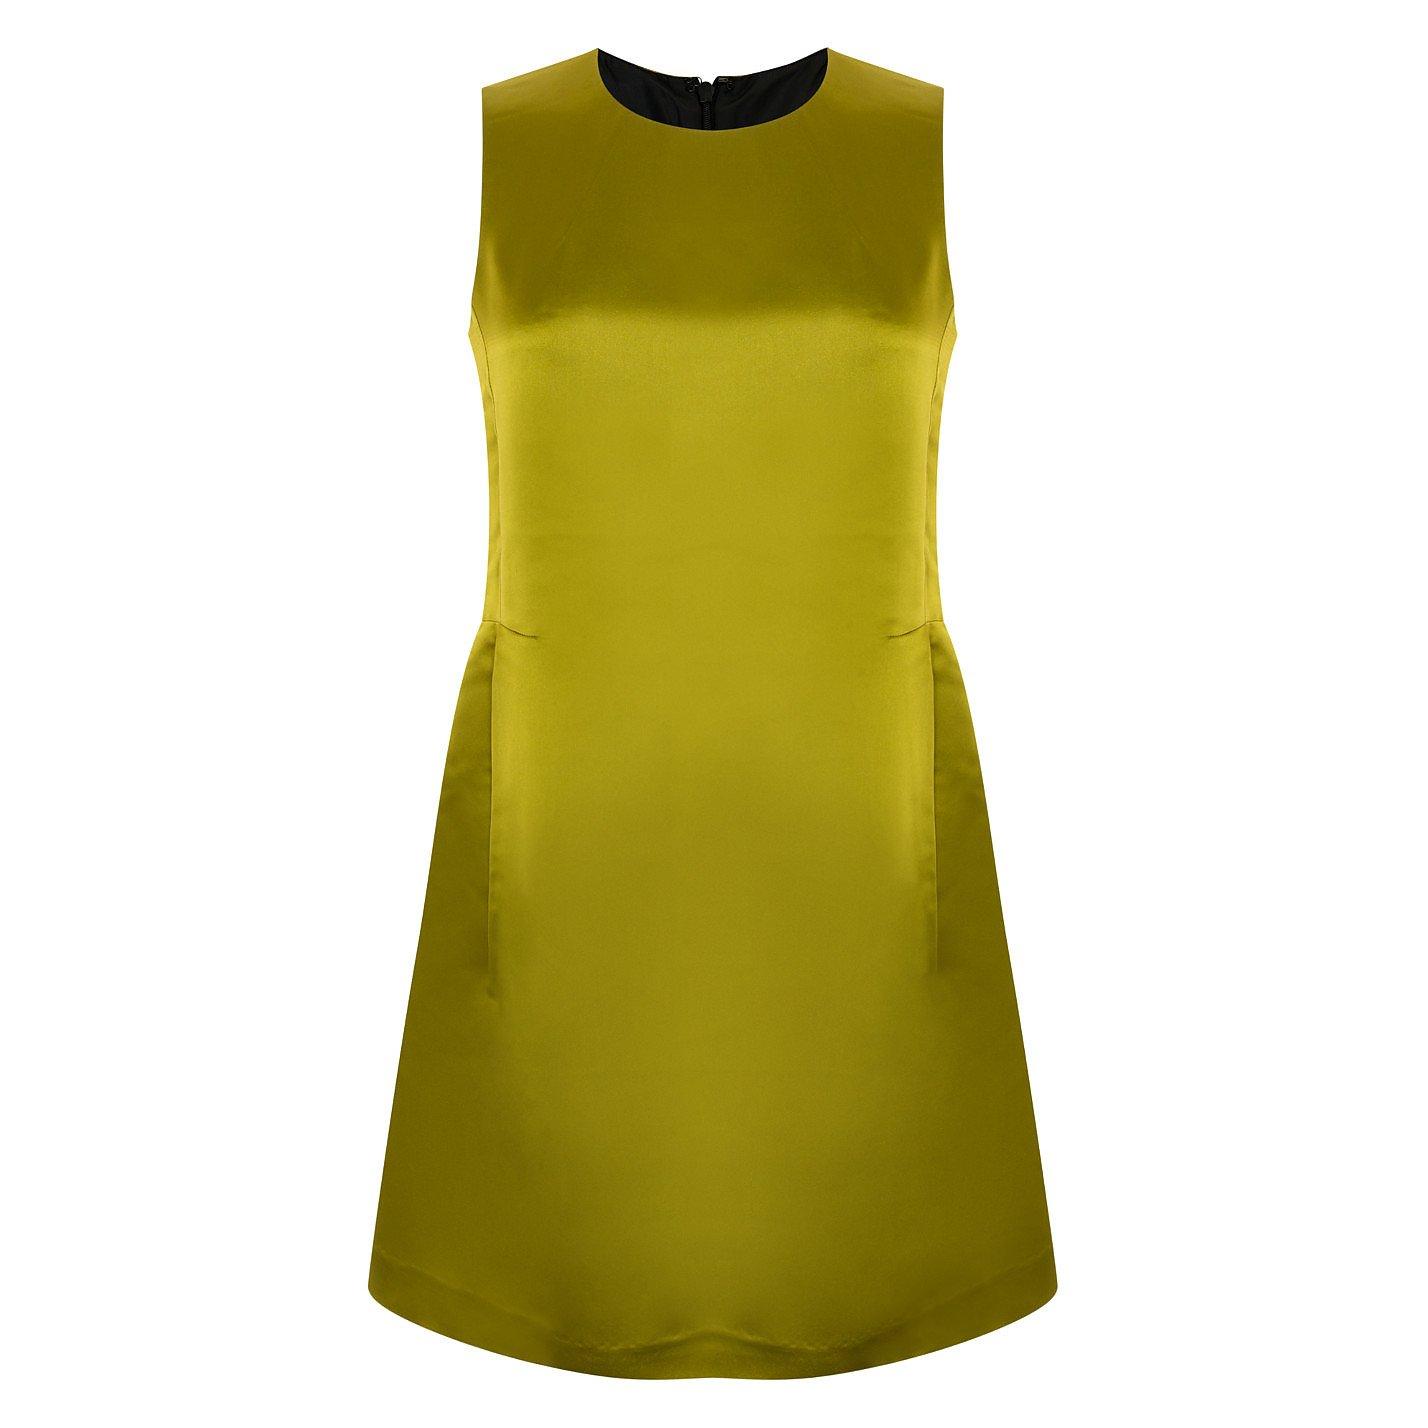 Vintage Metallic Mini Dress